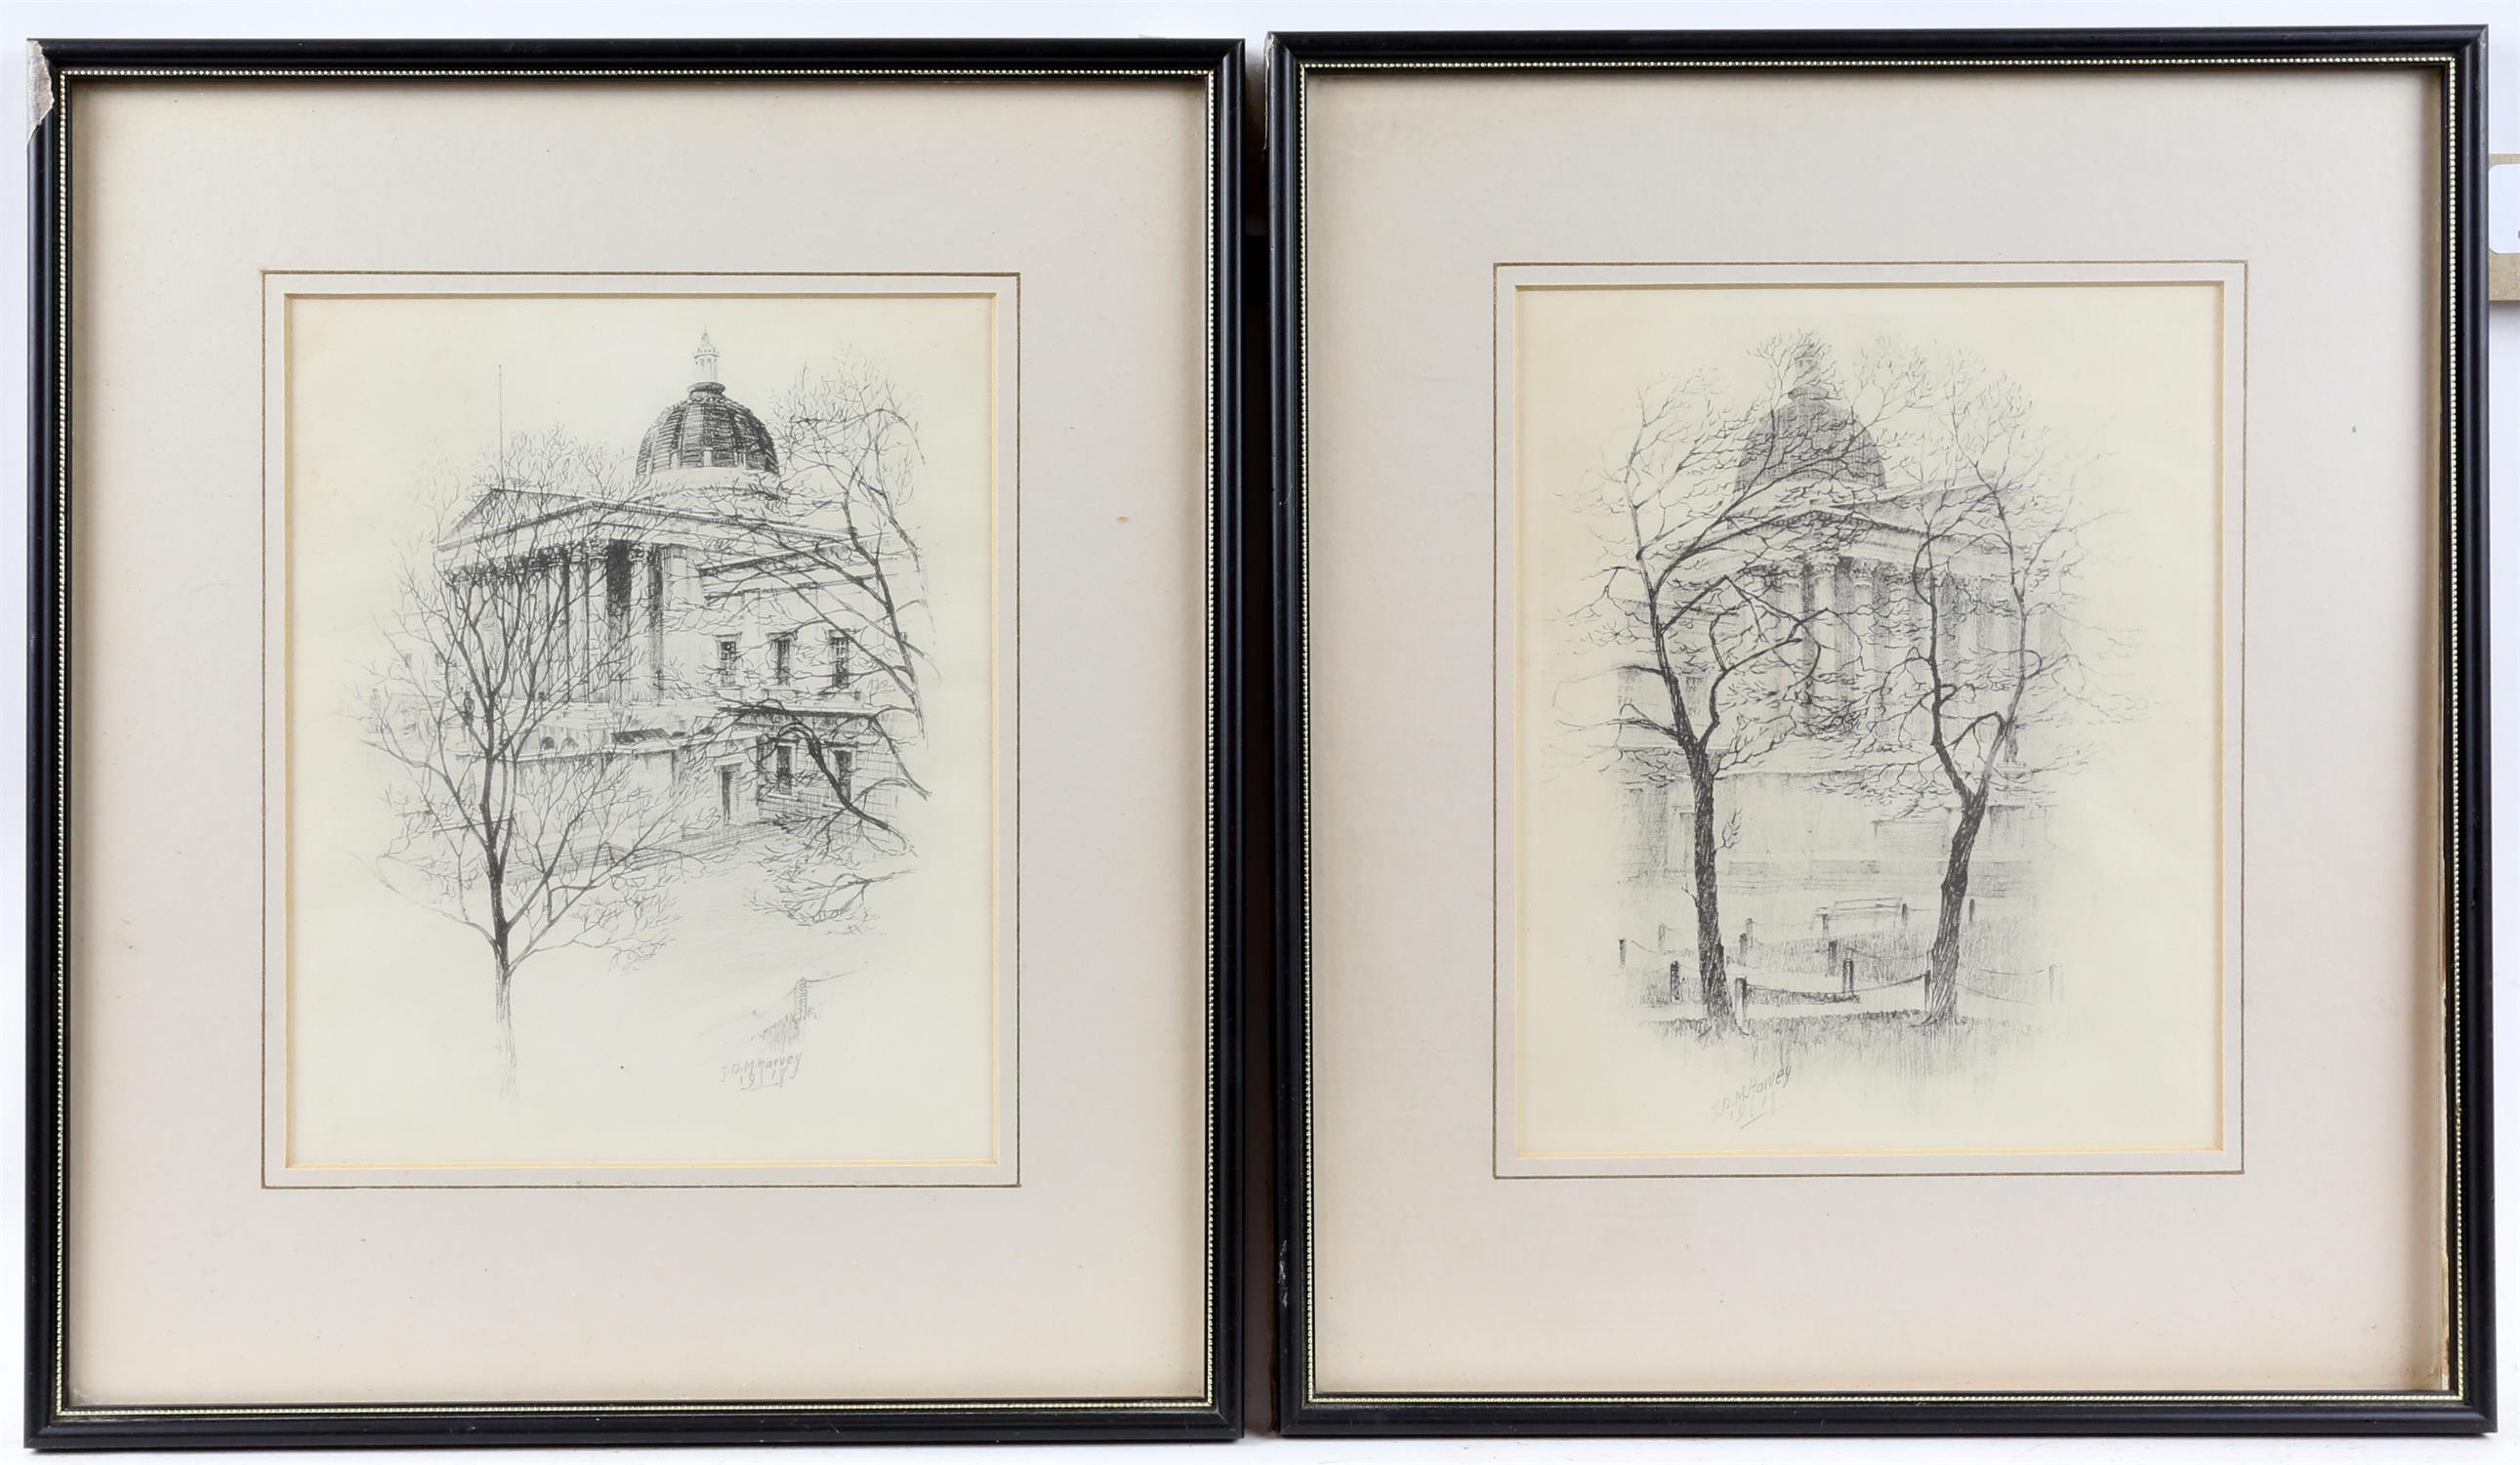 John Dean Monroe Harvey (1895-1978). Pair of Architectural Studies, possibly St Pauls.